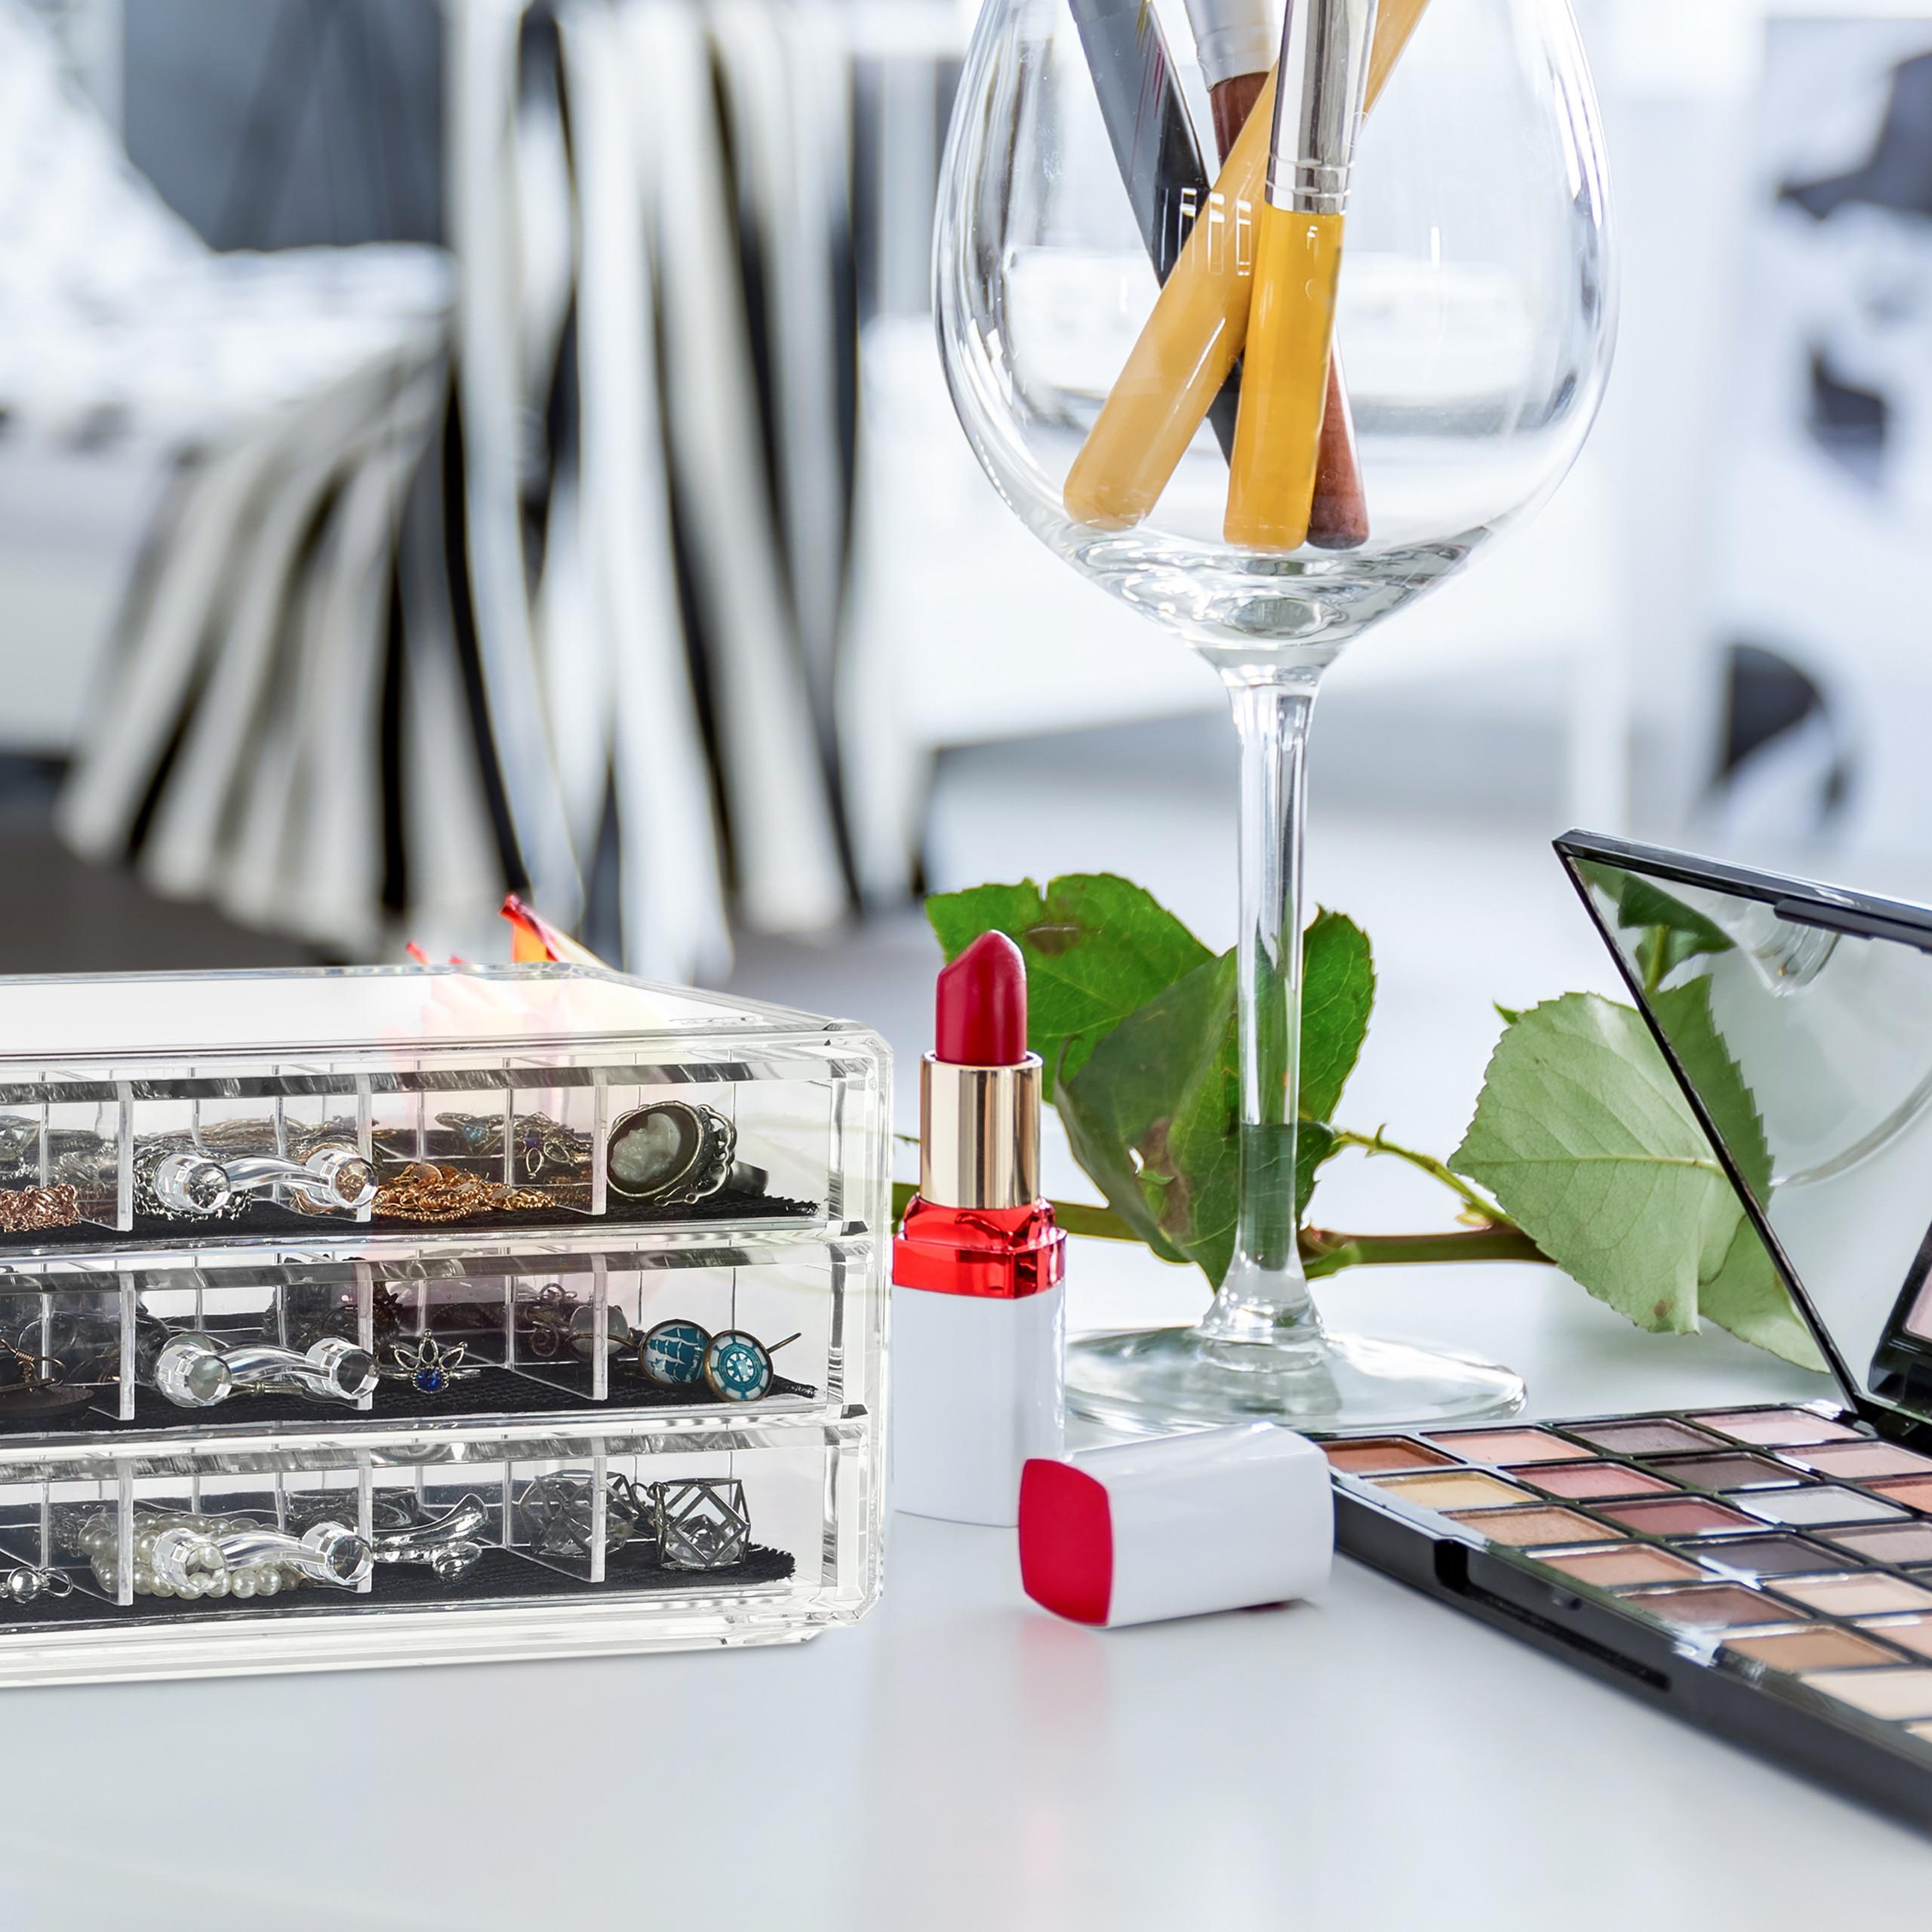 make-up-organizer-acryl-3-lades-met-vakken-acrylbox-cosmeticabox-opbergdoos miniatuur 5